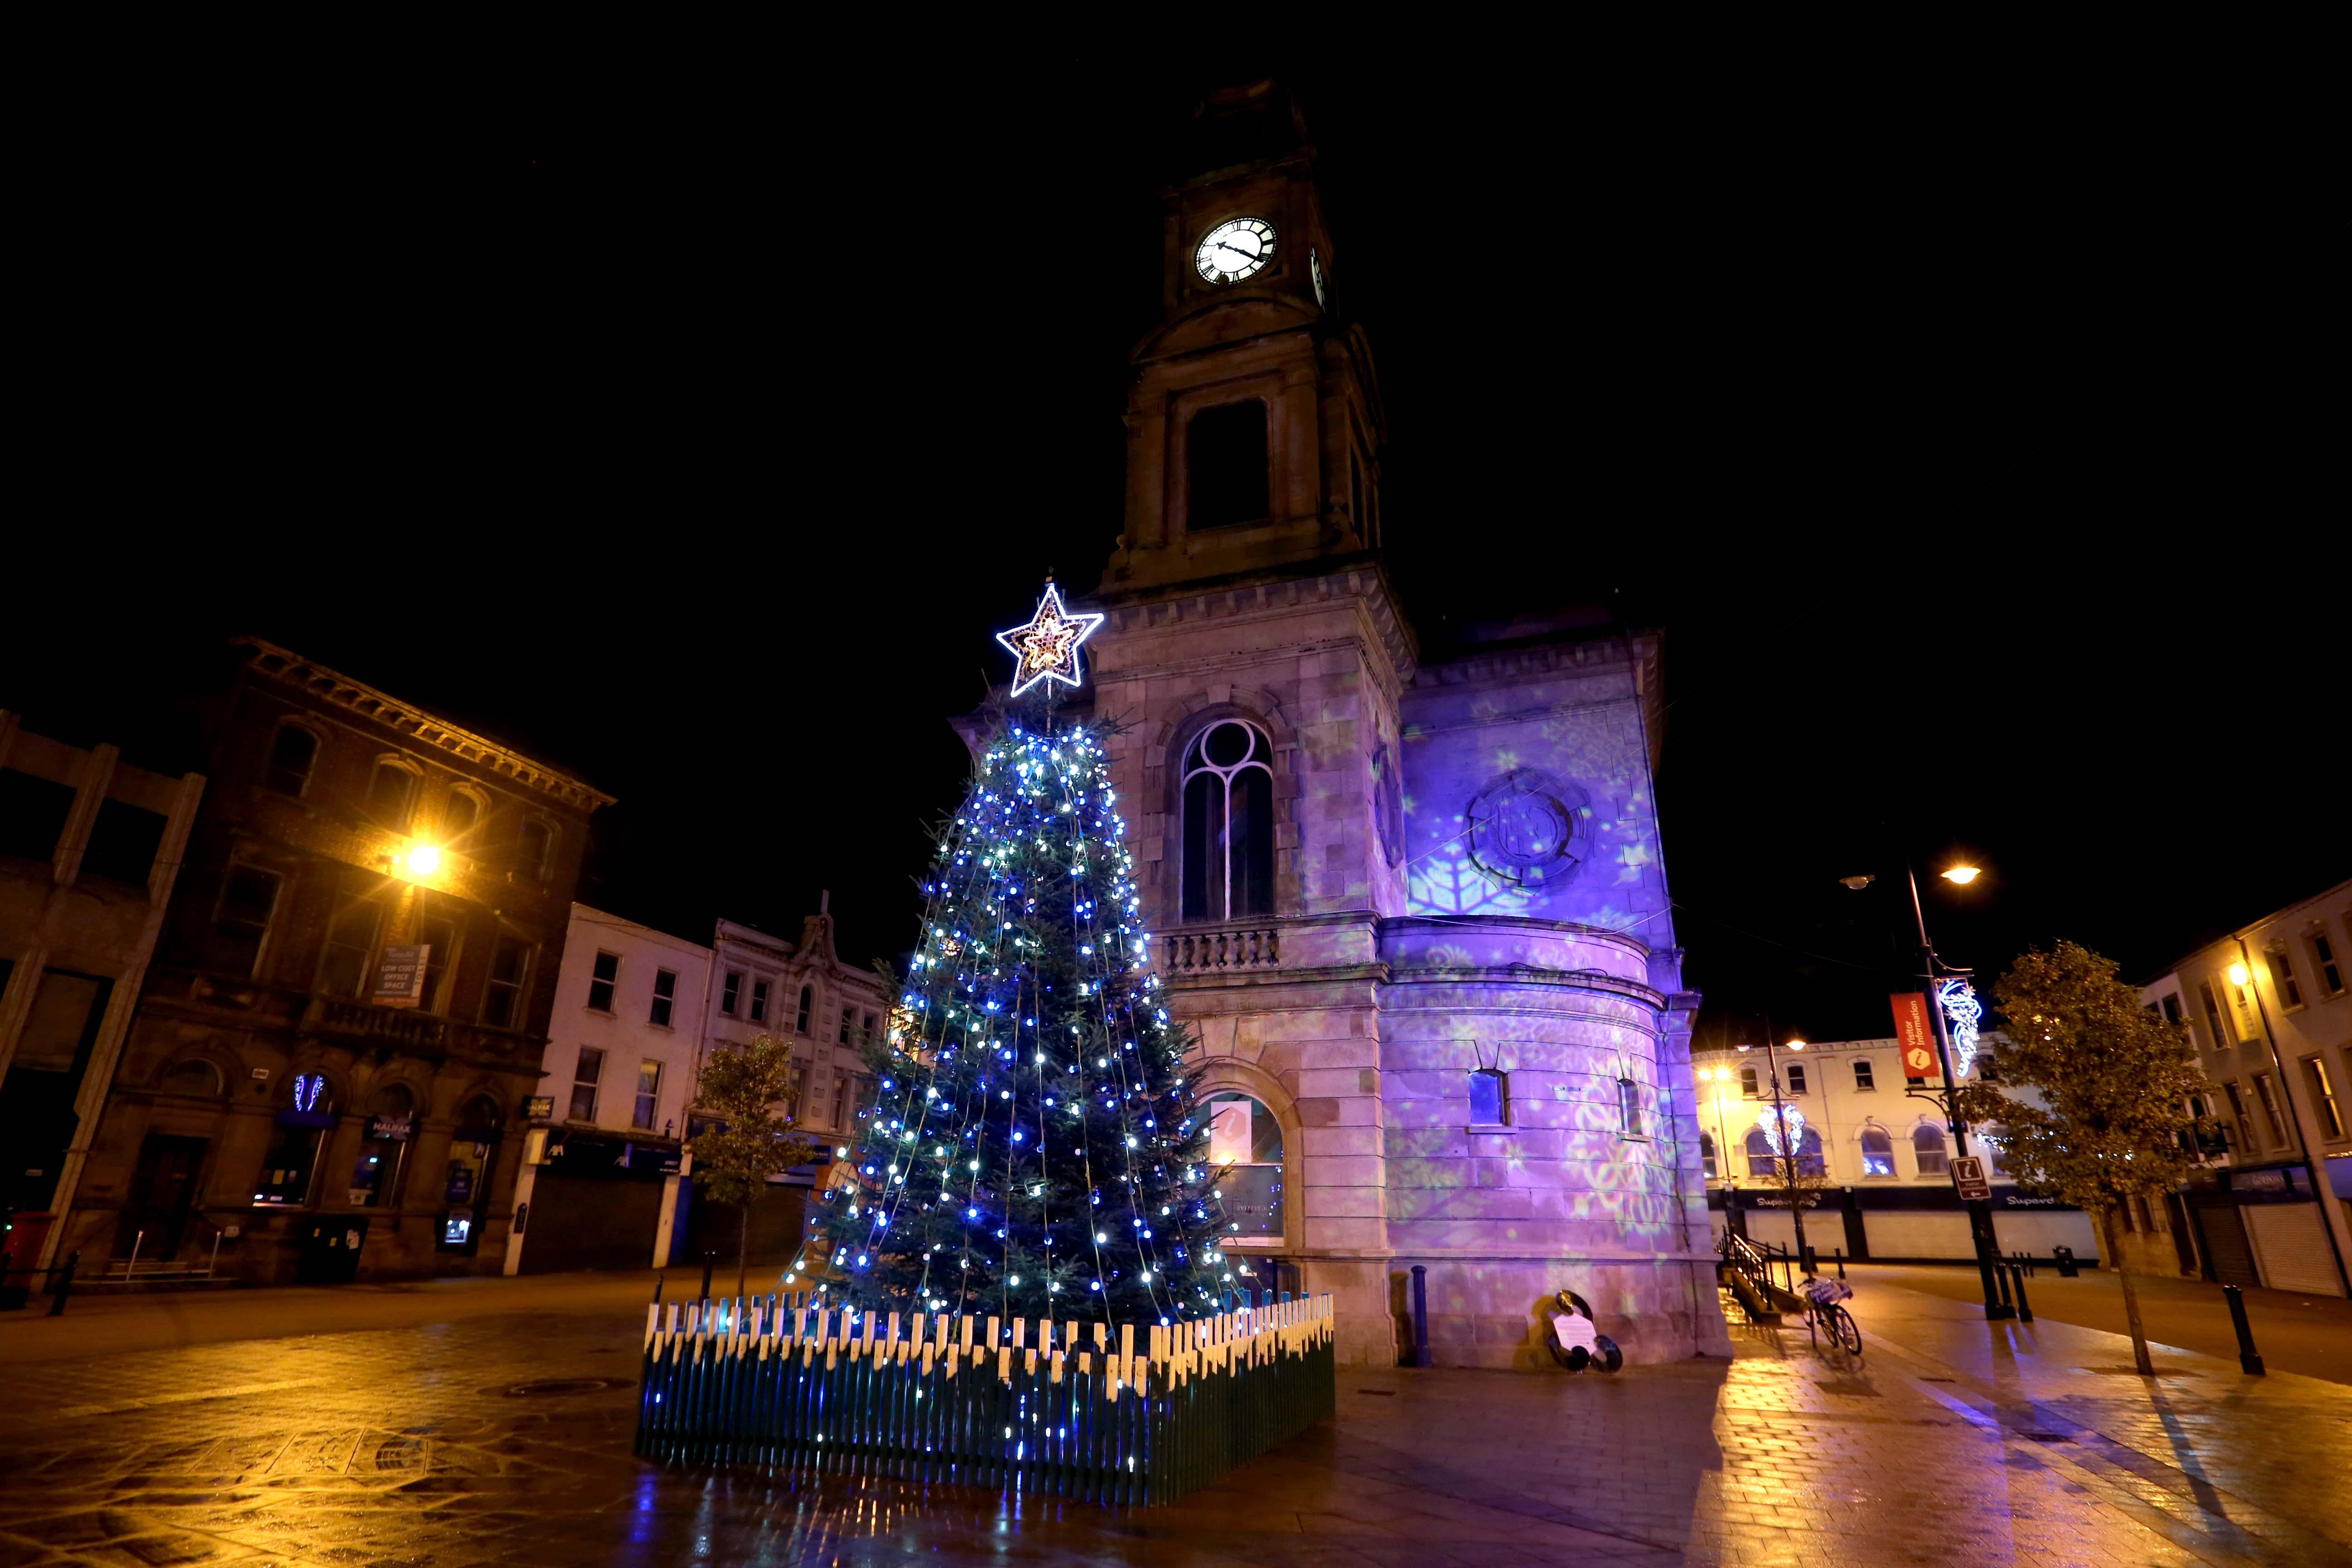 Christmas Lights Shine Brightly Across The Borough